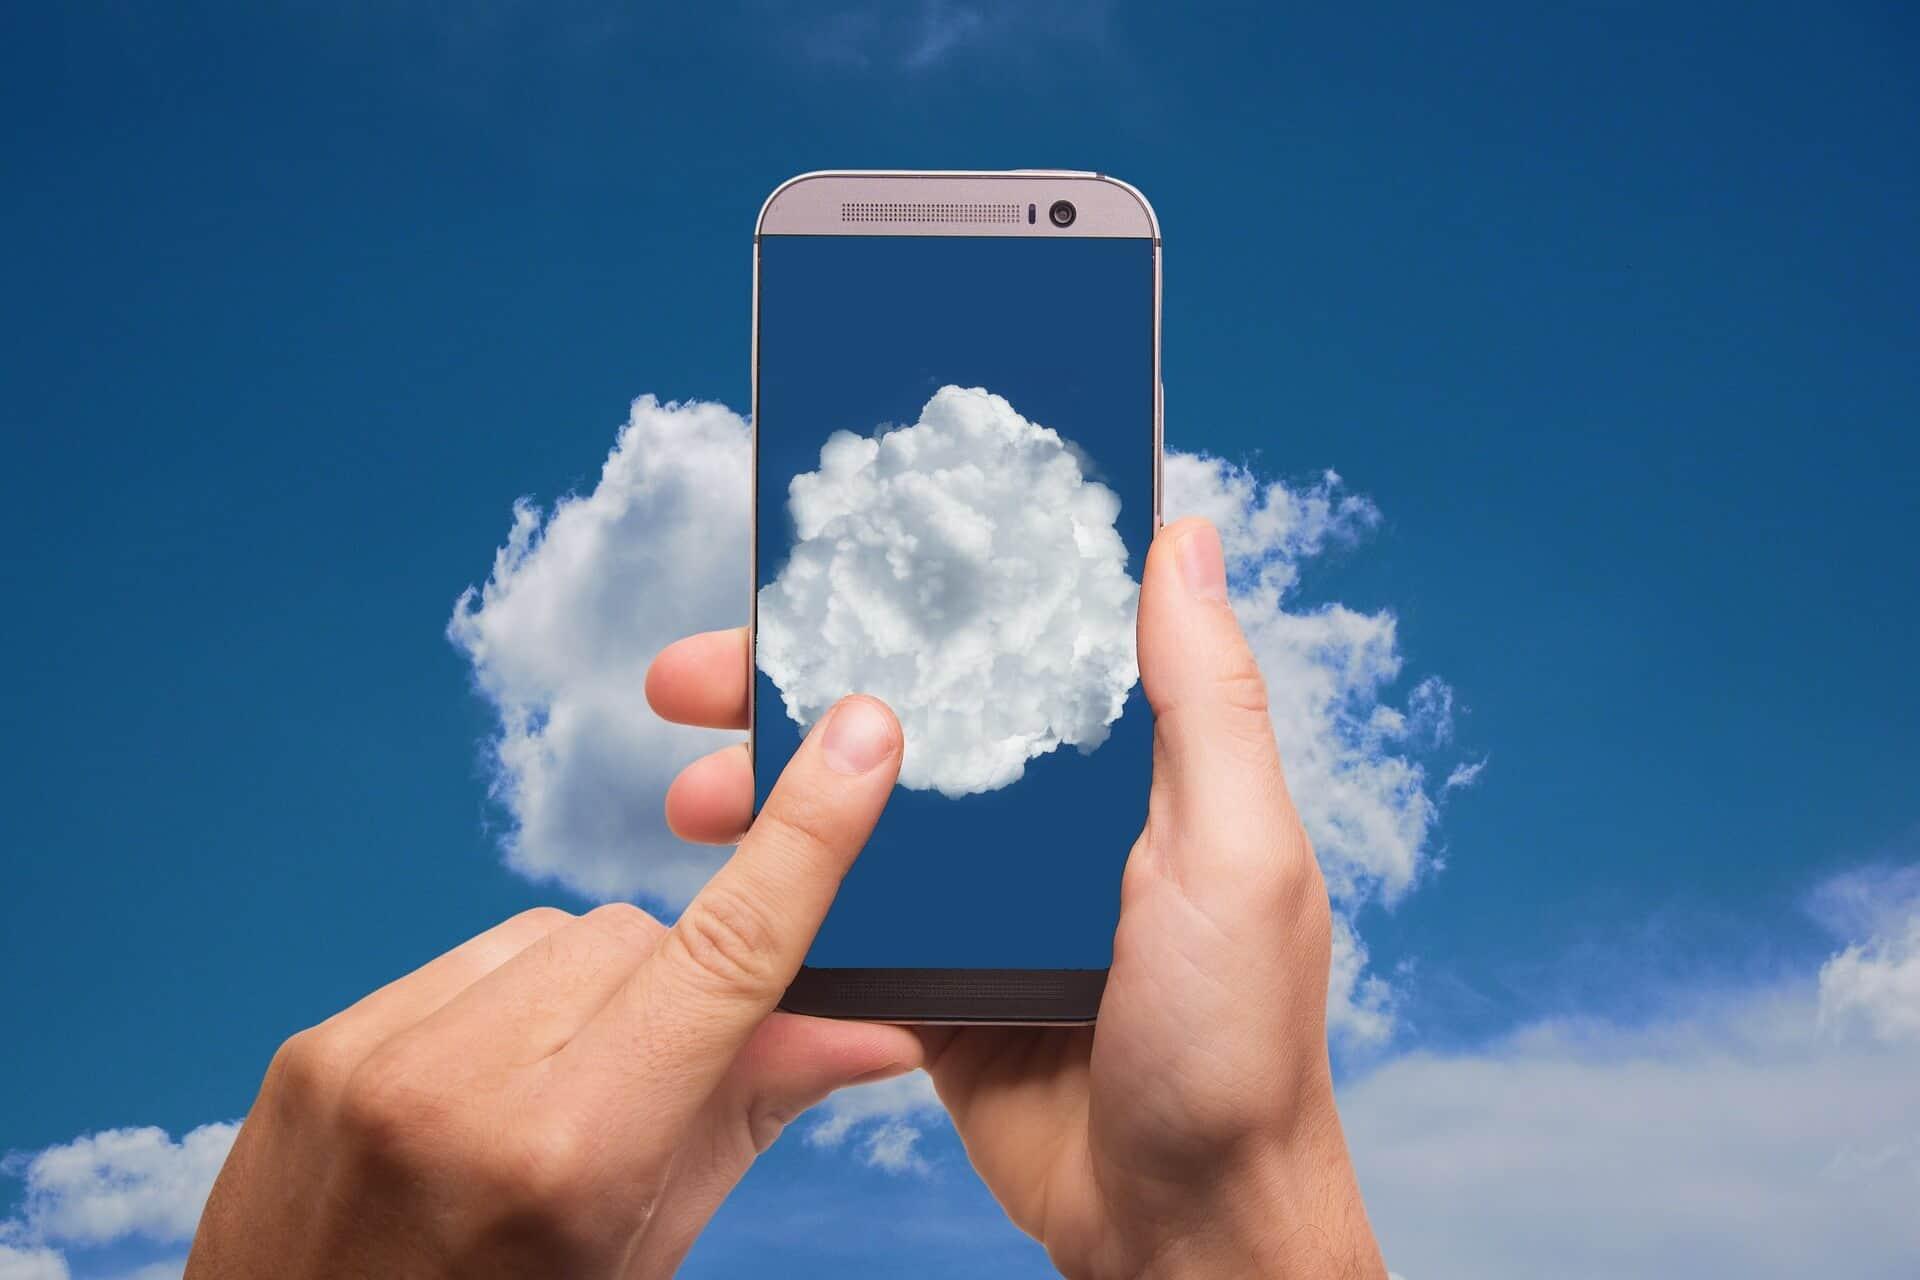 content/de-de/images/repository/isc/2020/what-is-cloud-security.jpg